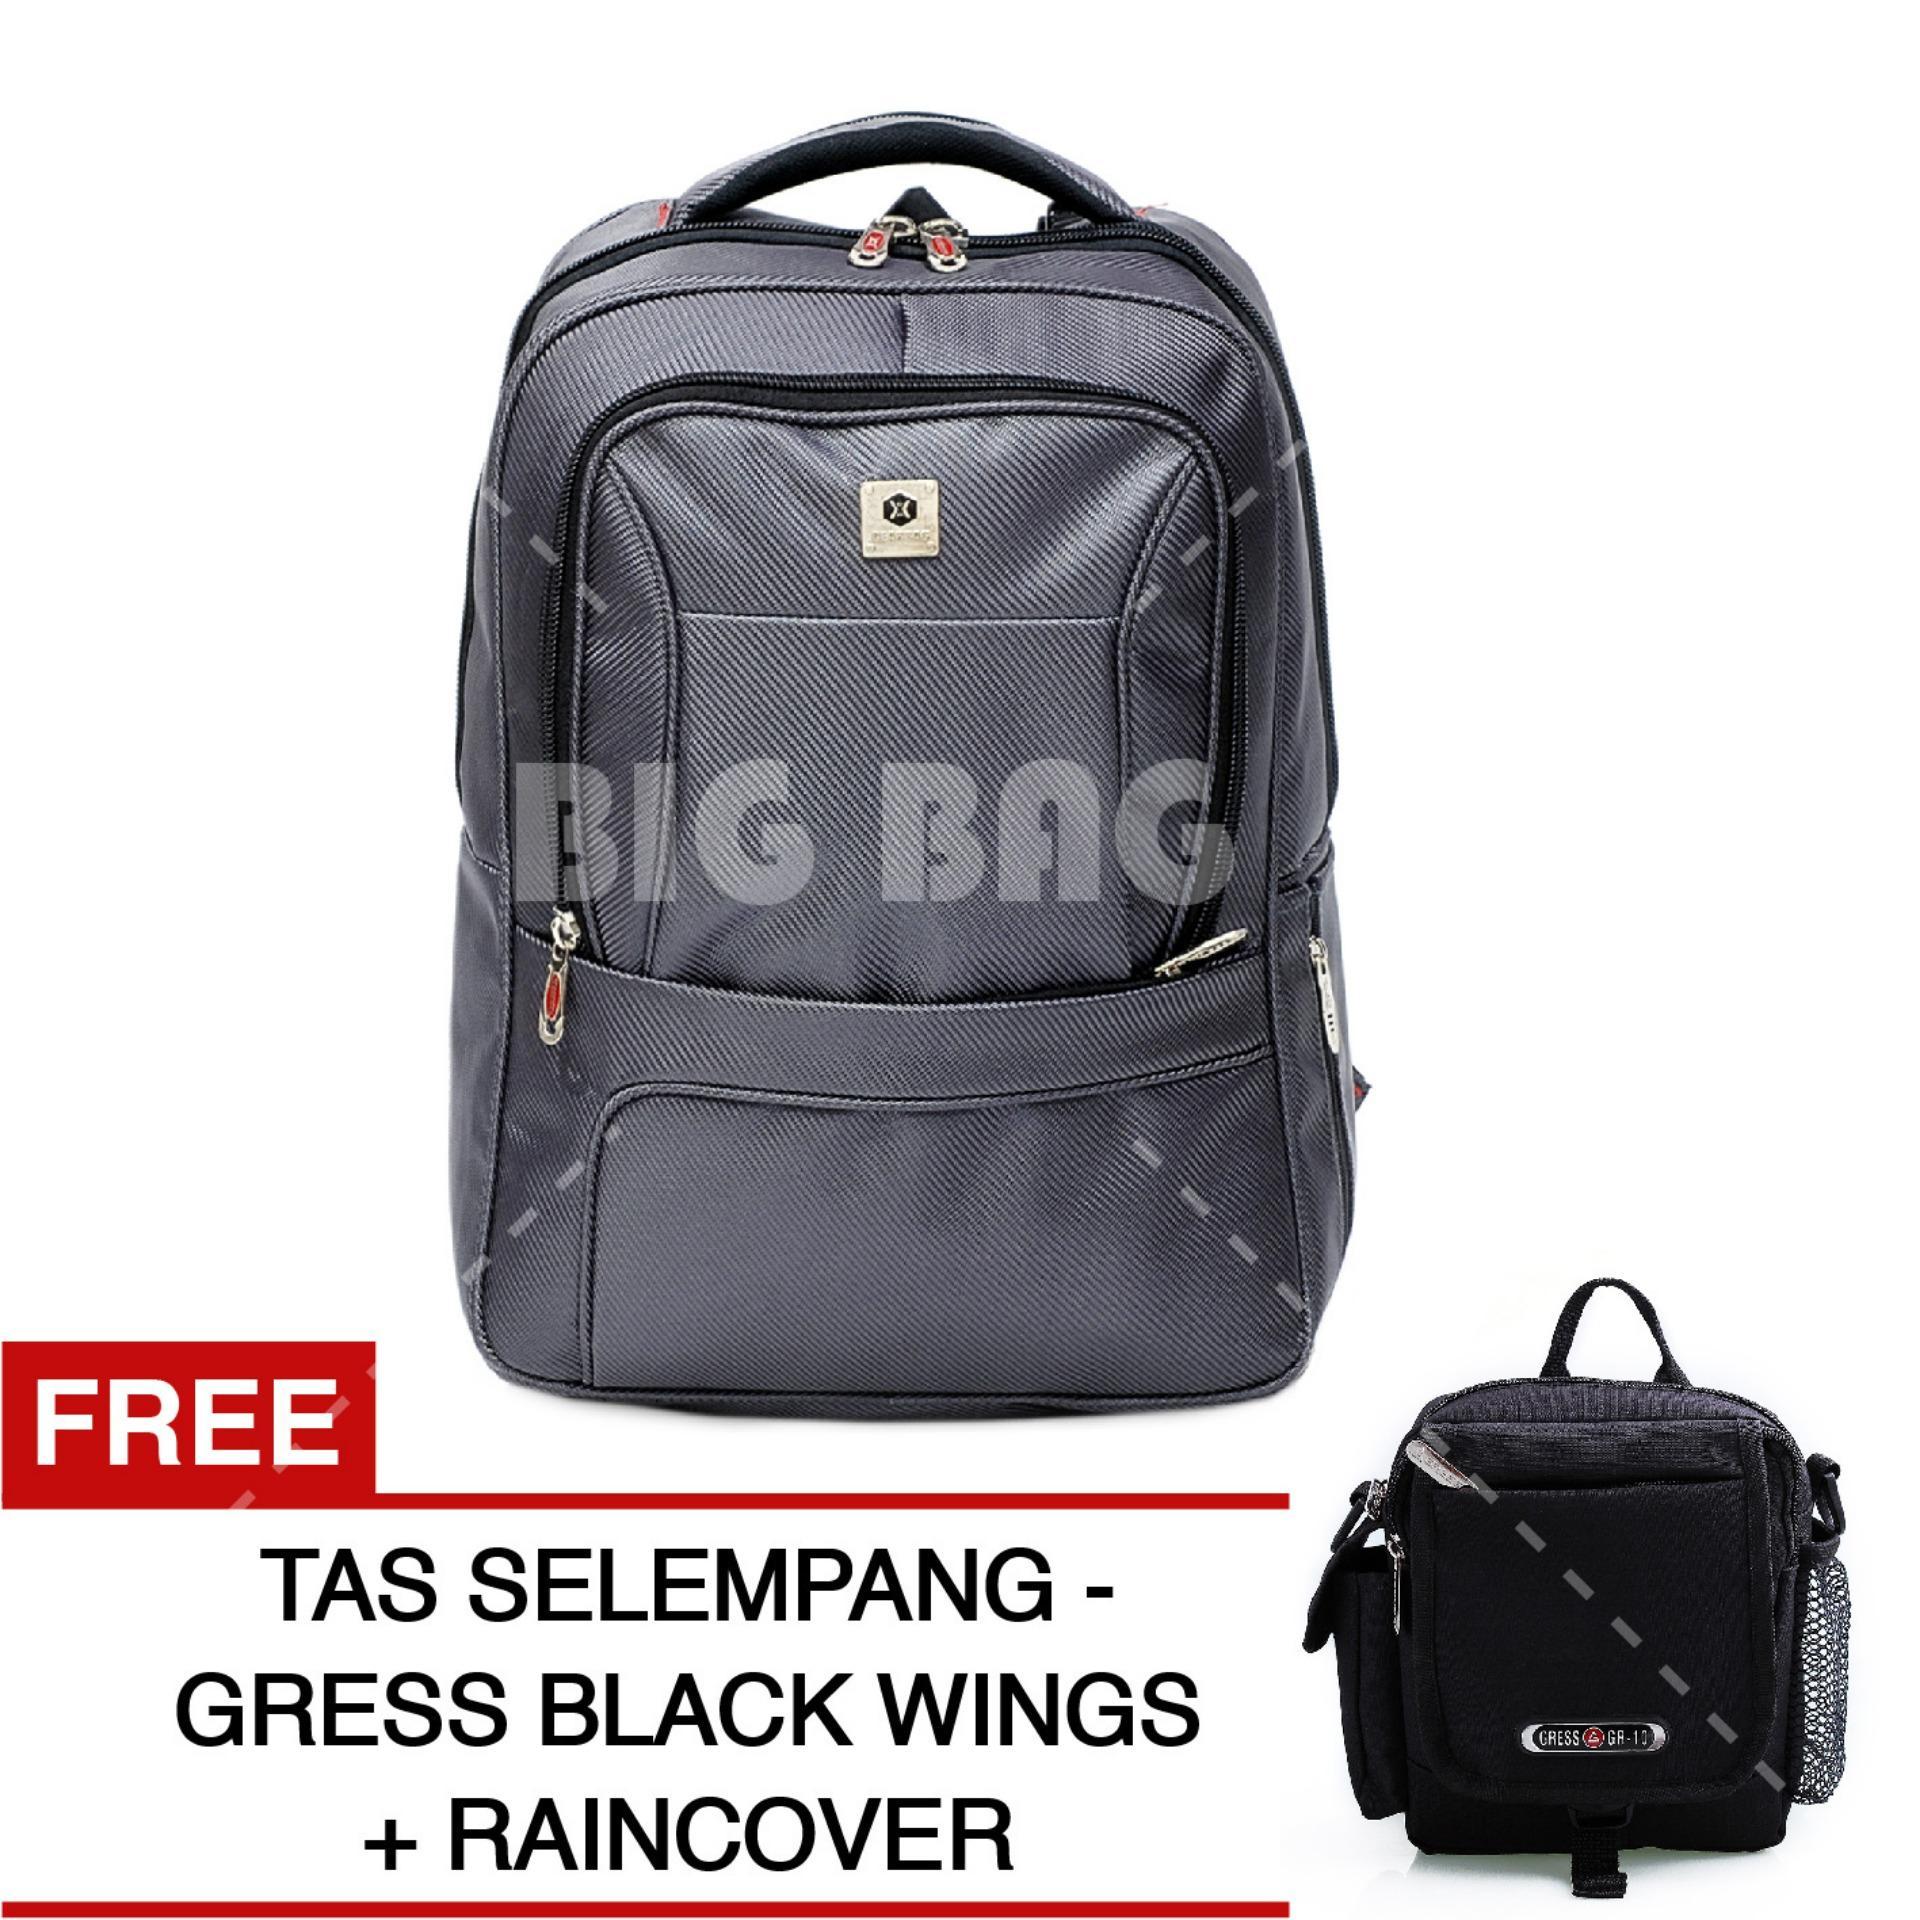 Tas Ransel Gear Bag - Silver Swarms Edition Tas Laptop Backpack + FREE Tas Selempang Gress Black Wings Tas Pria Tas Kerja Tas Messenger Tas Slempang Tas Fashion Pria